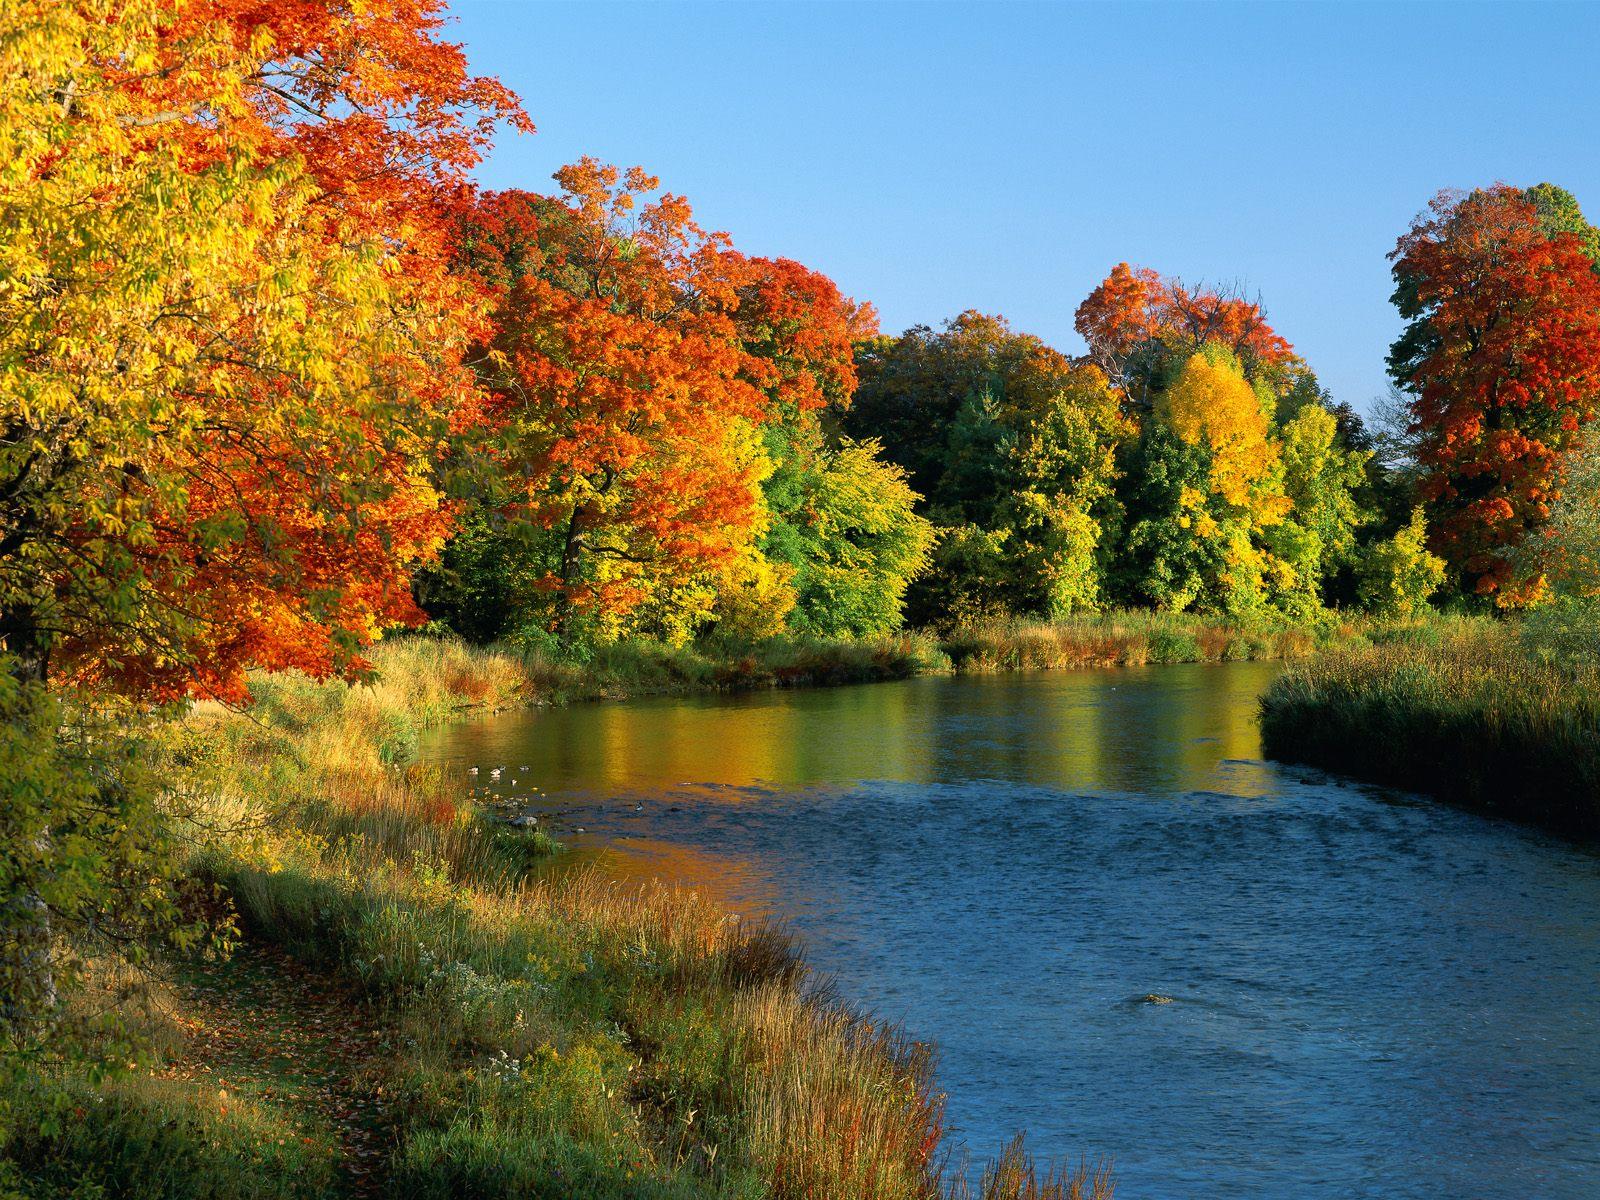 River Ontario Canada postcard Credit River Ontario Canada wallpaper 1600x1200